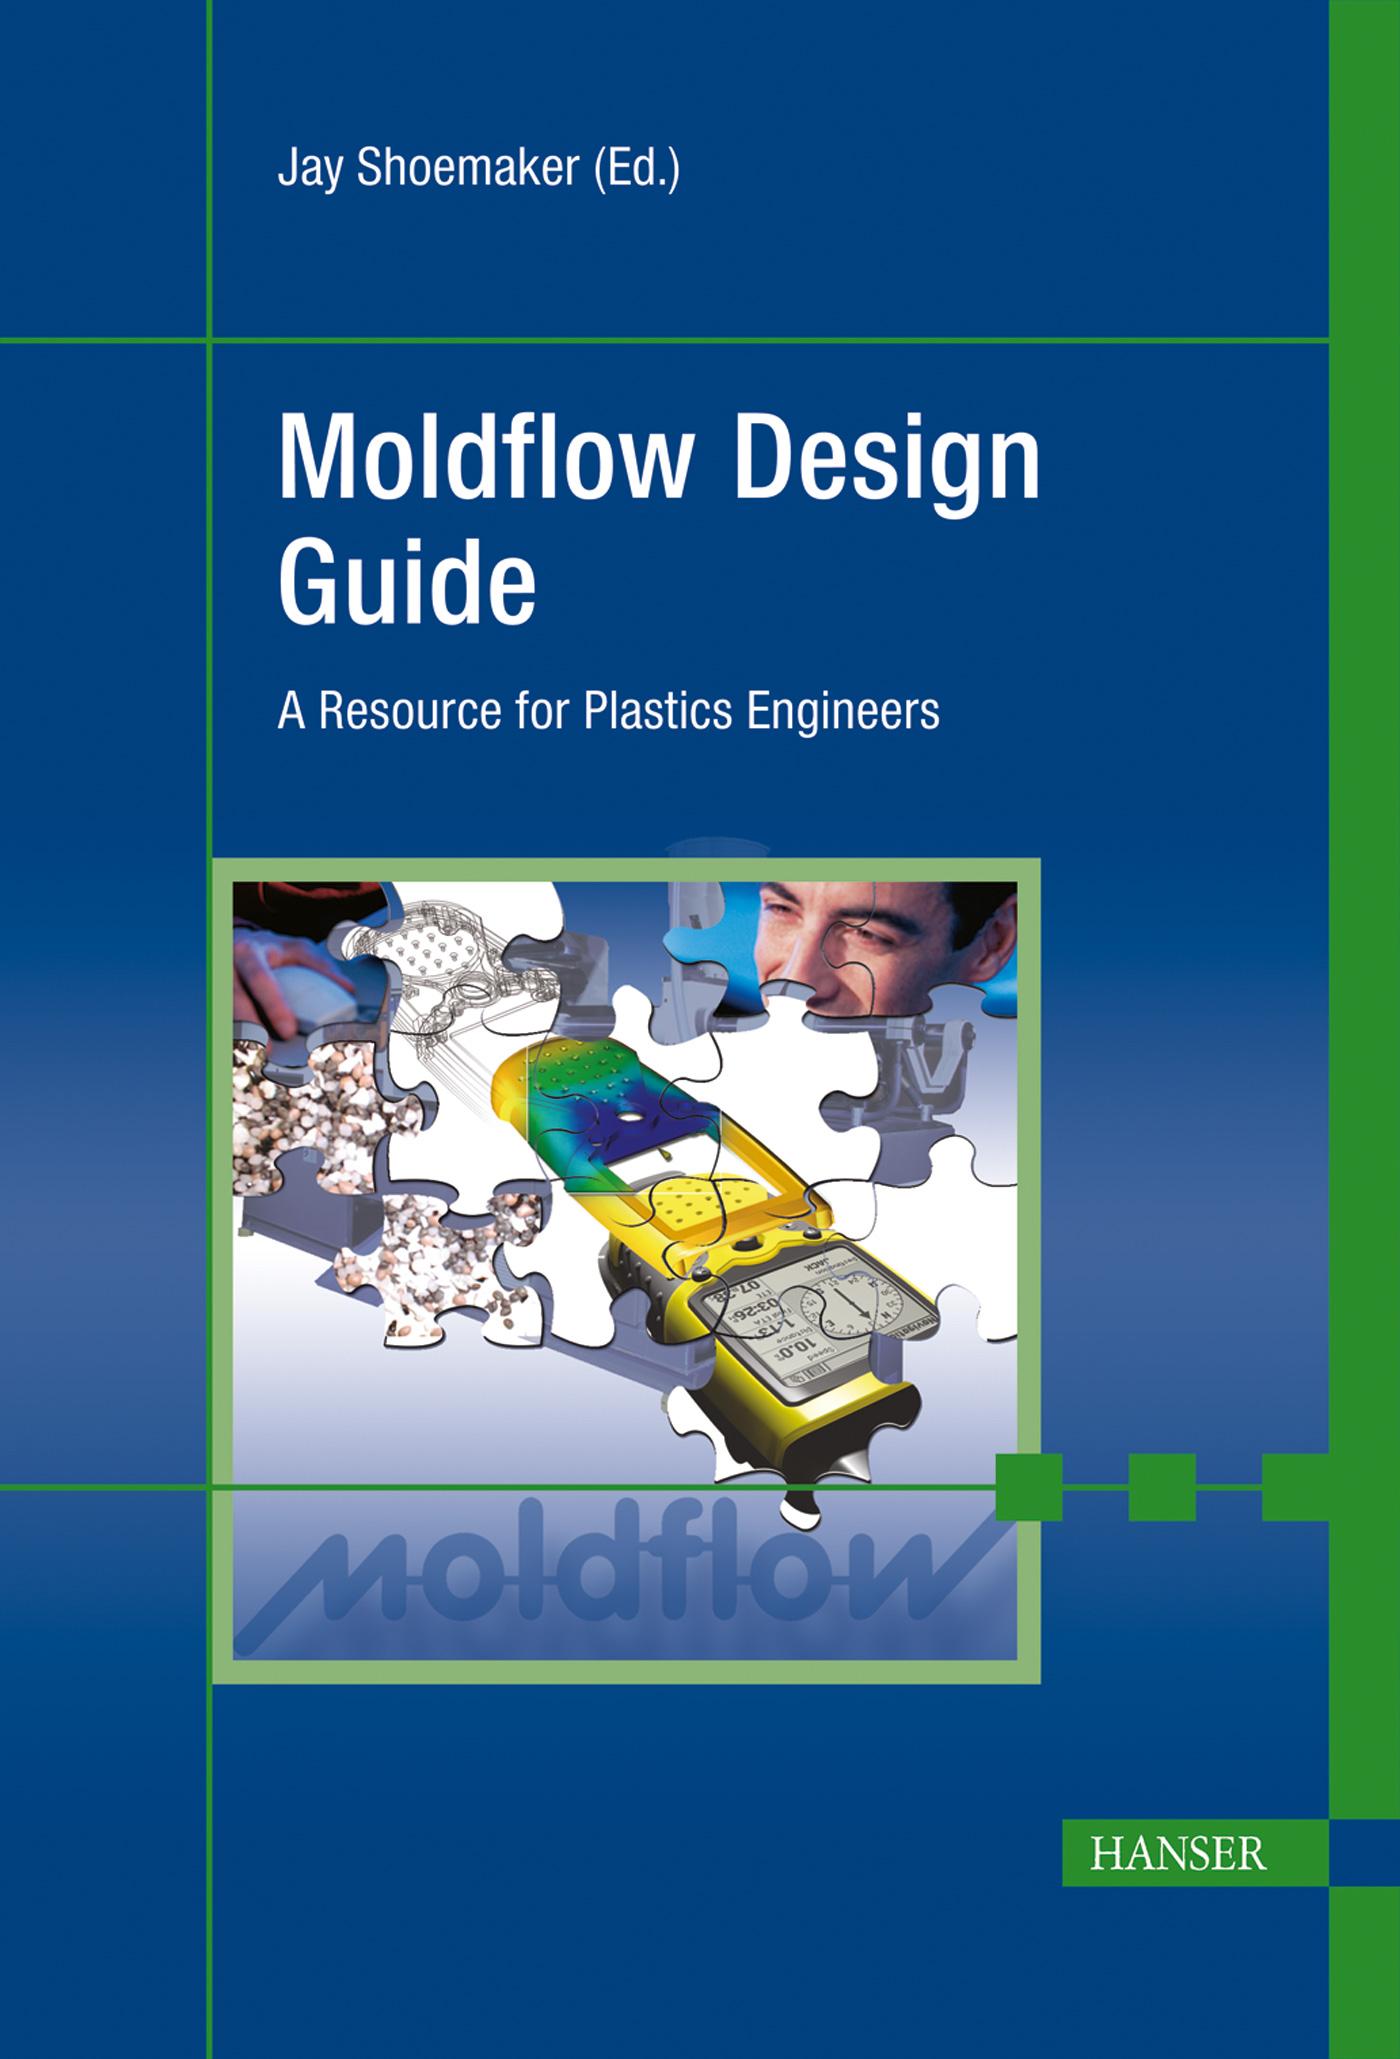 Shoemaker, Moldflow Design Guide, 978-3-446-40640-7